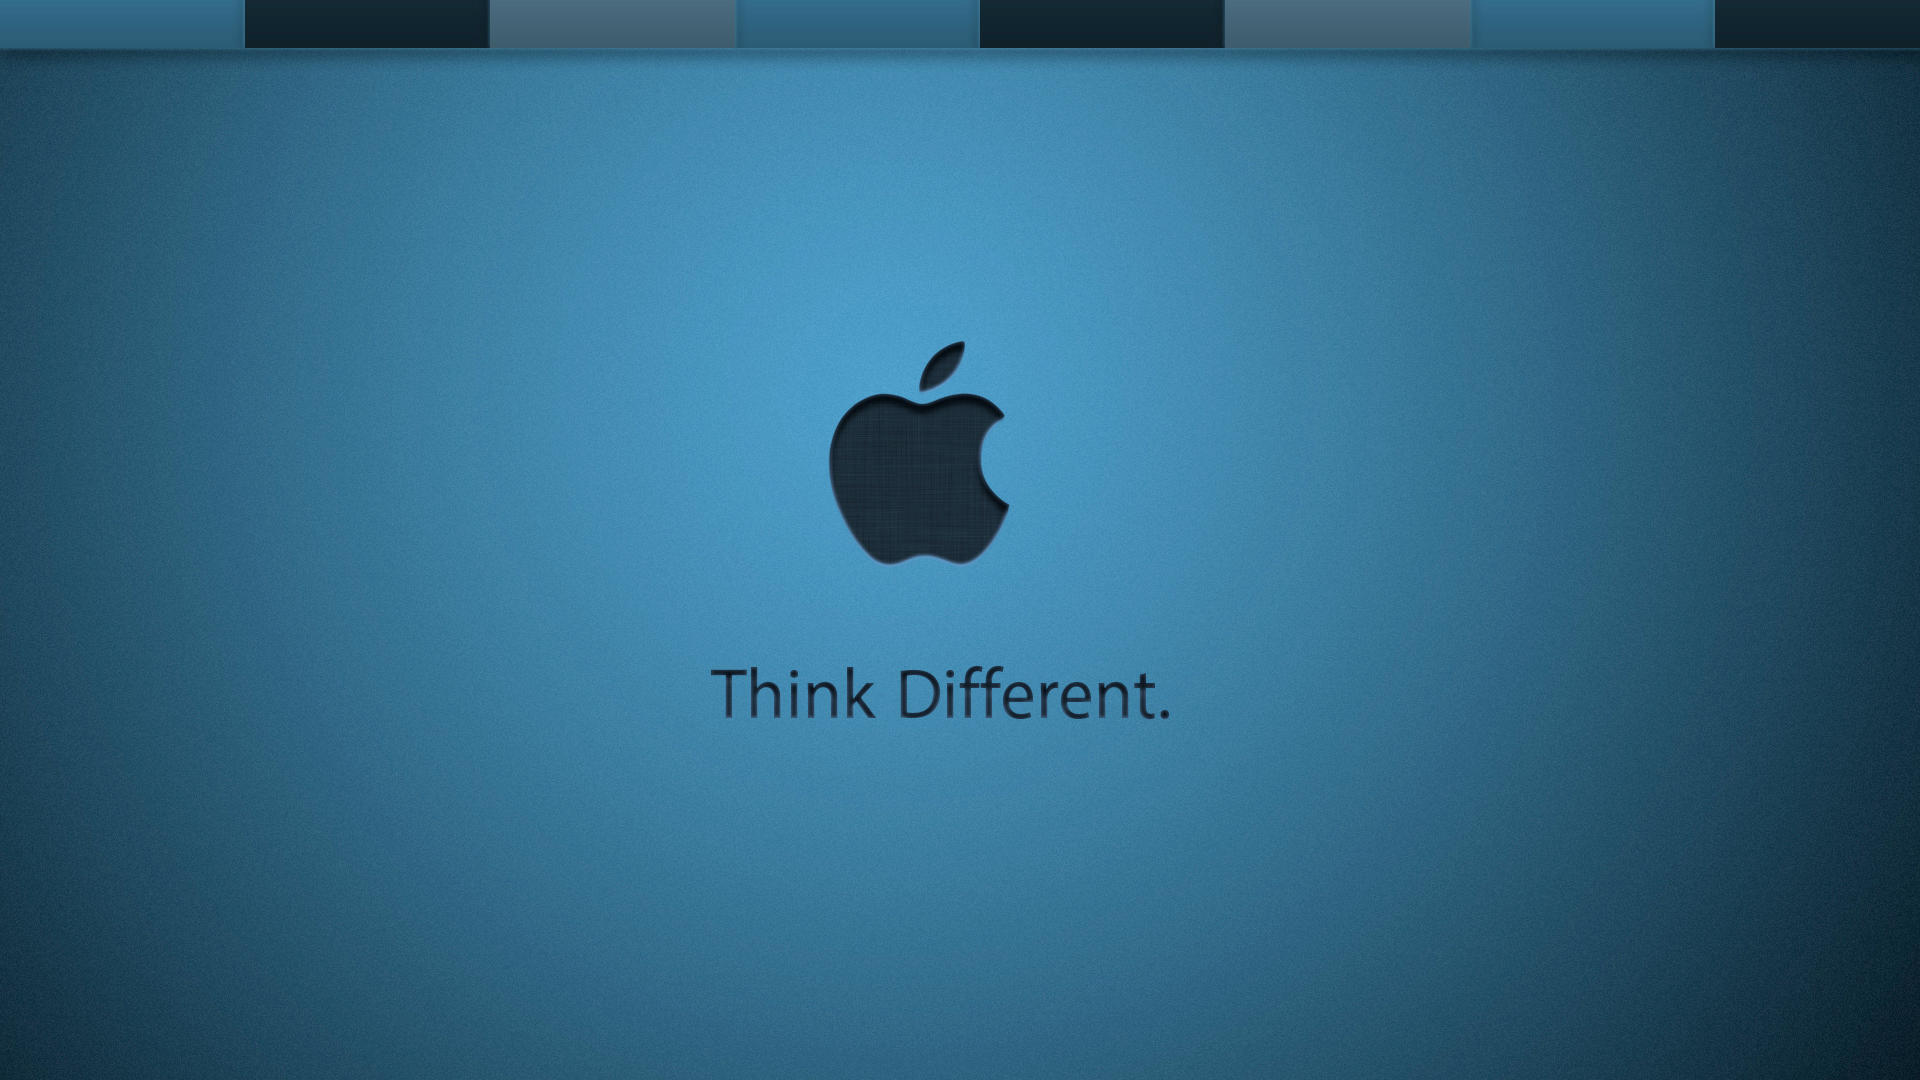 macbook air wallpaper quotes